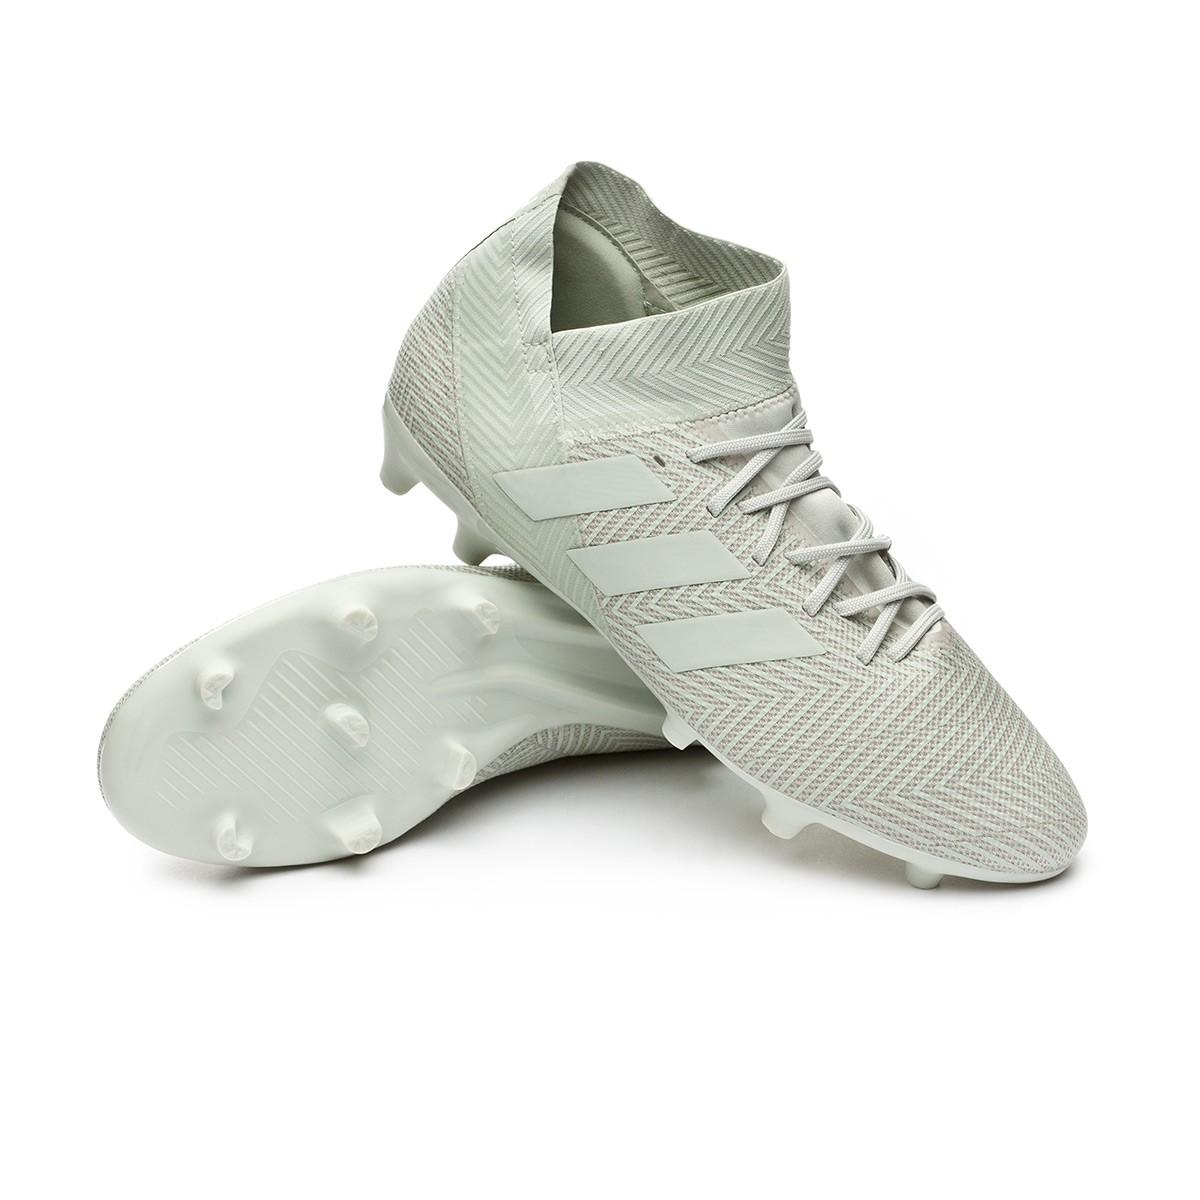 976ff7f82b3 Football Boots adidas Nemeziz 18.3 FG Ash silver-White tint - Tienda ...